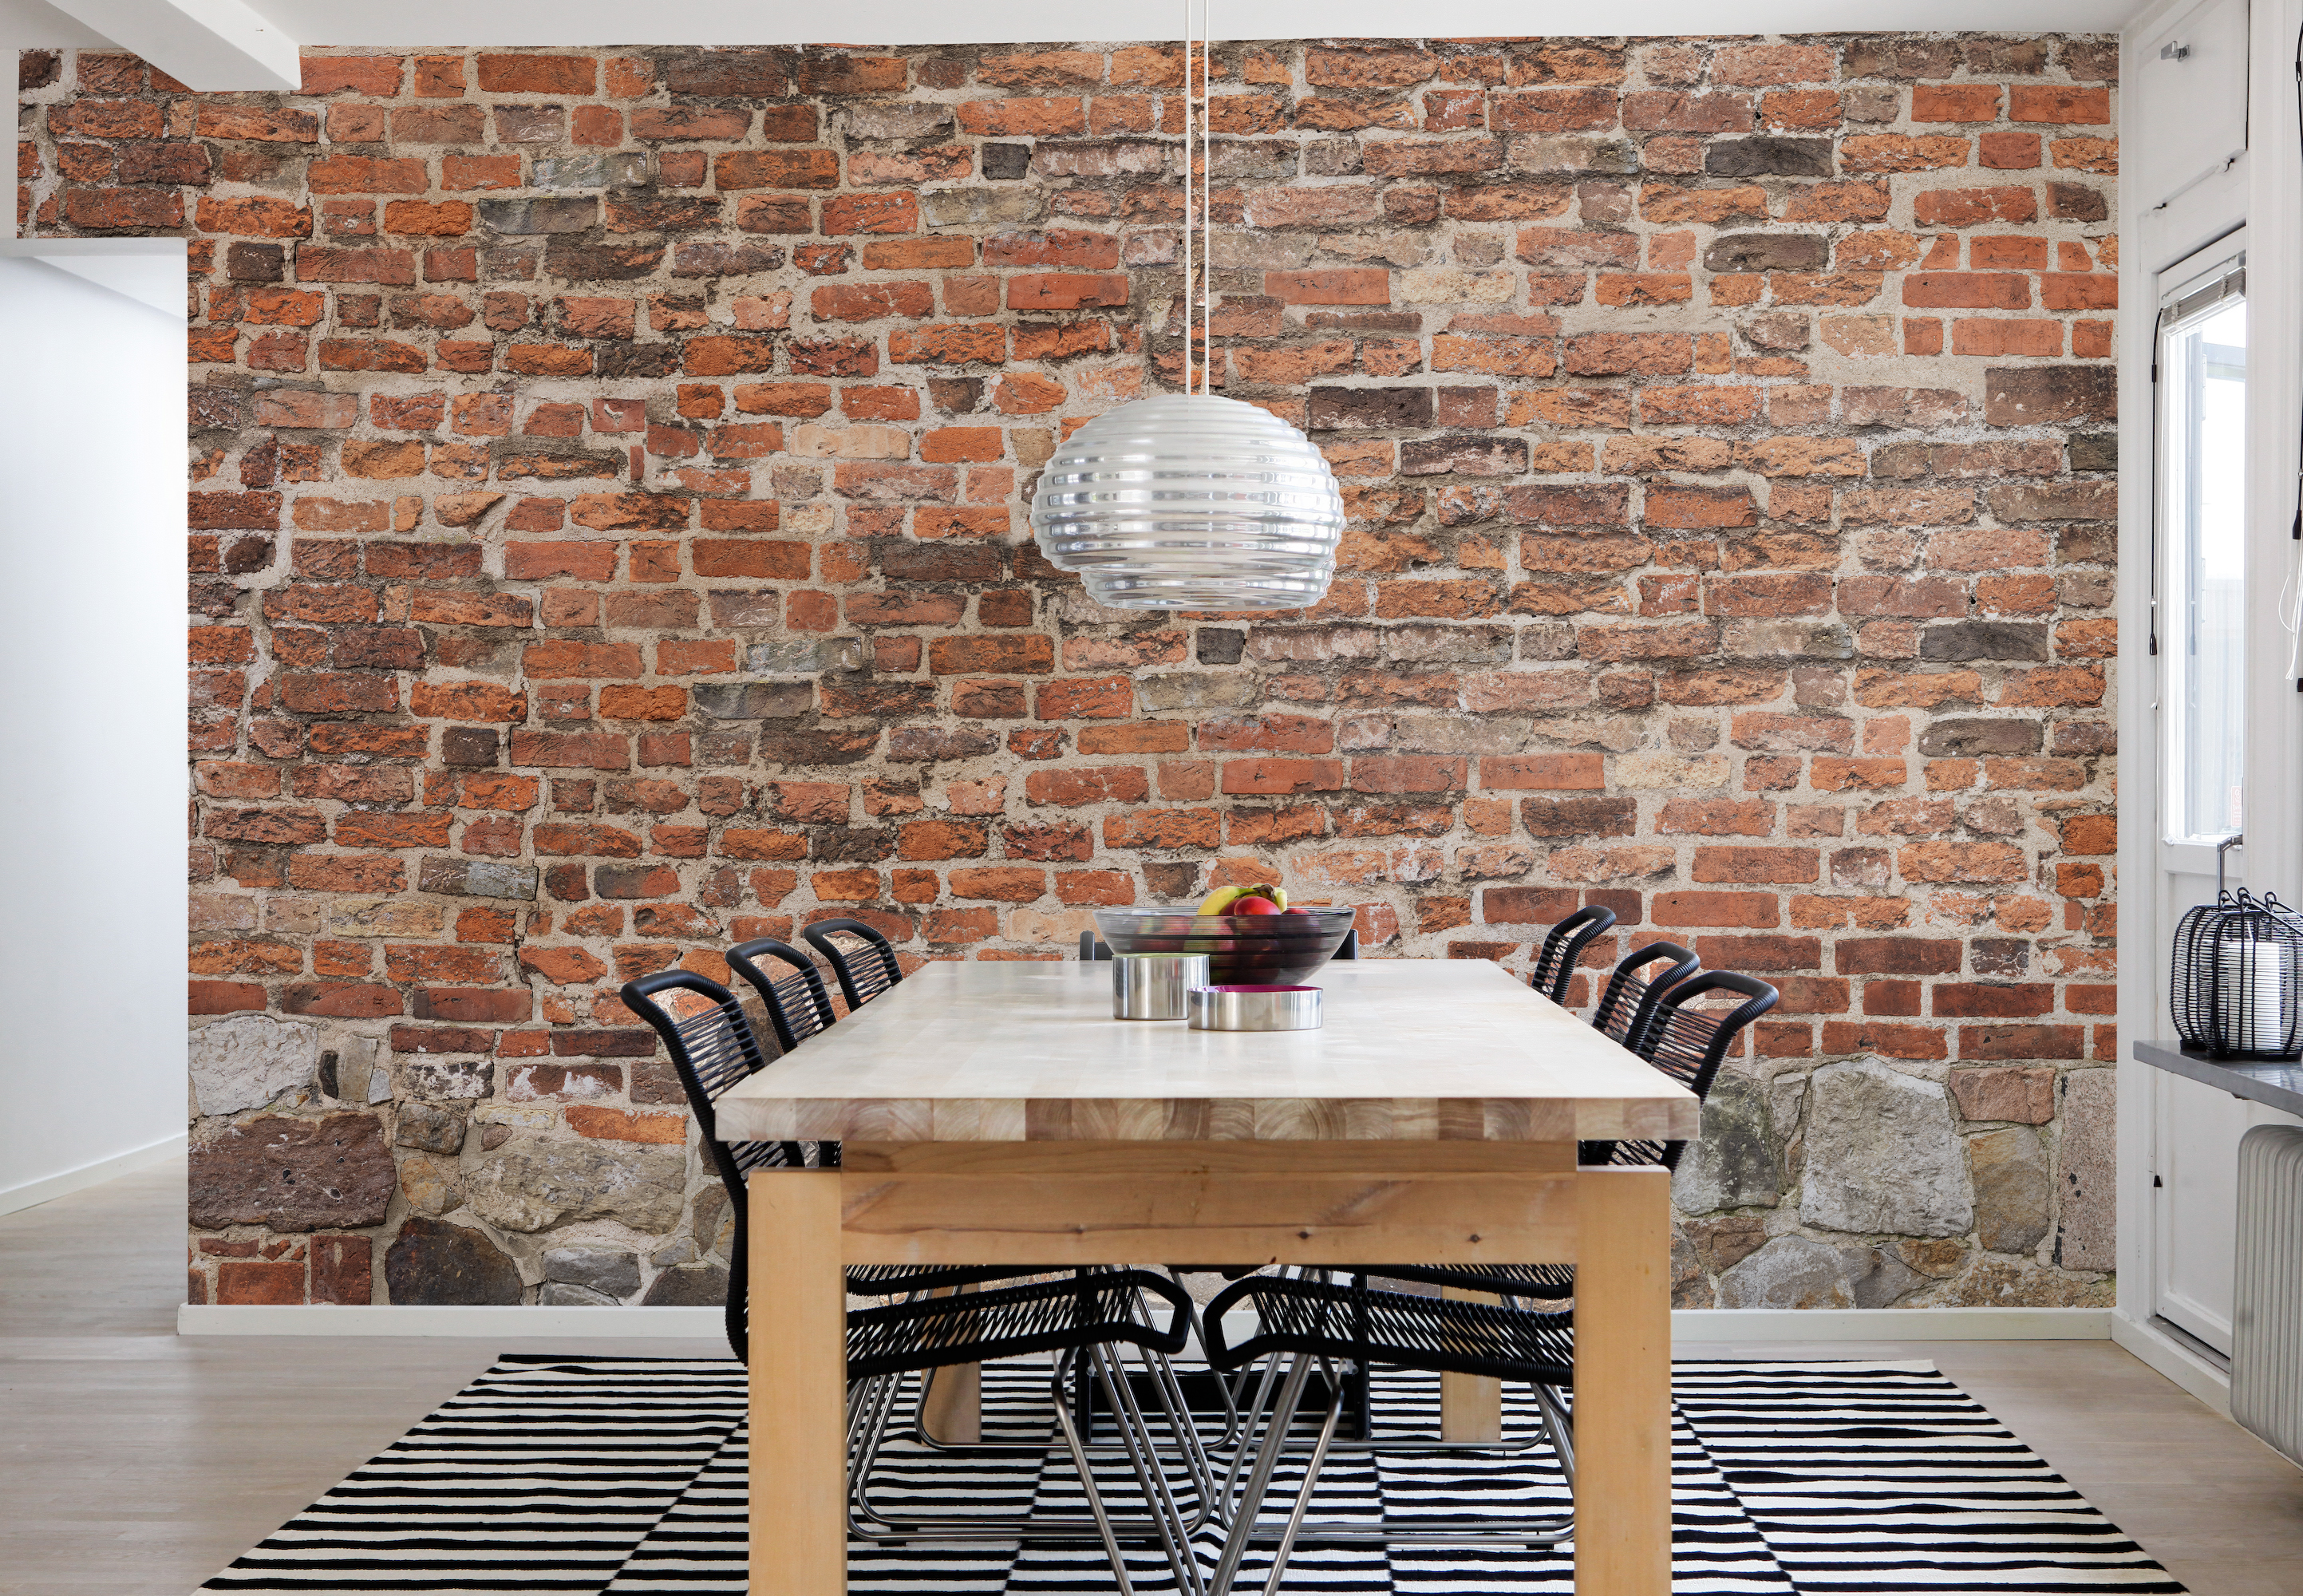 9+] Brick Wallpaper in Kitchen on WallpaperSafari